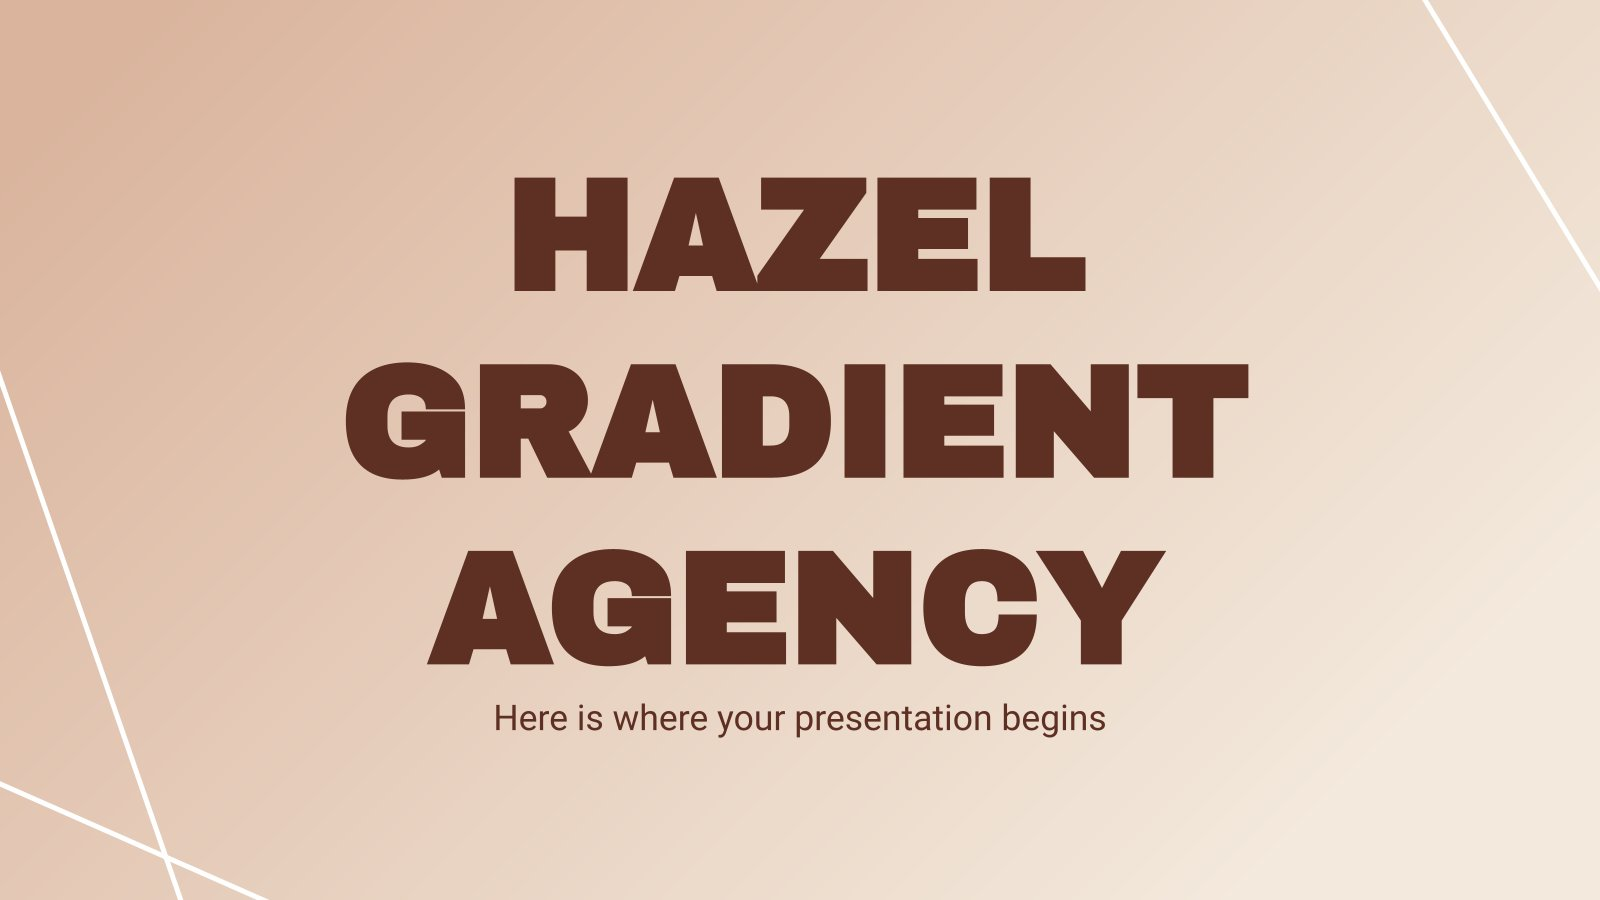 Hazel Gradients Agency presentation template